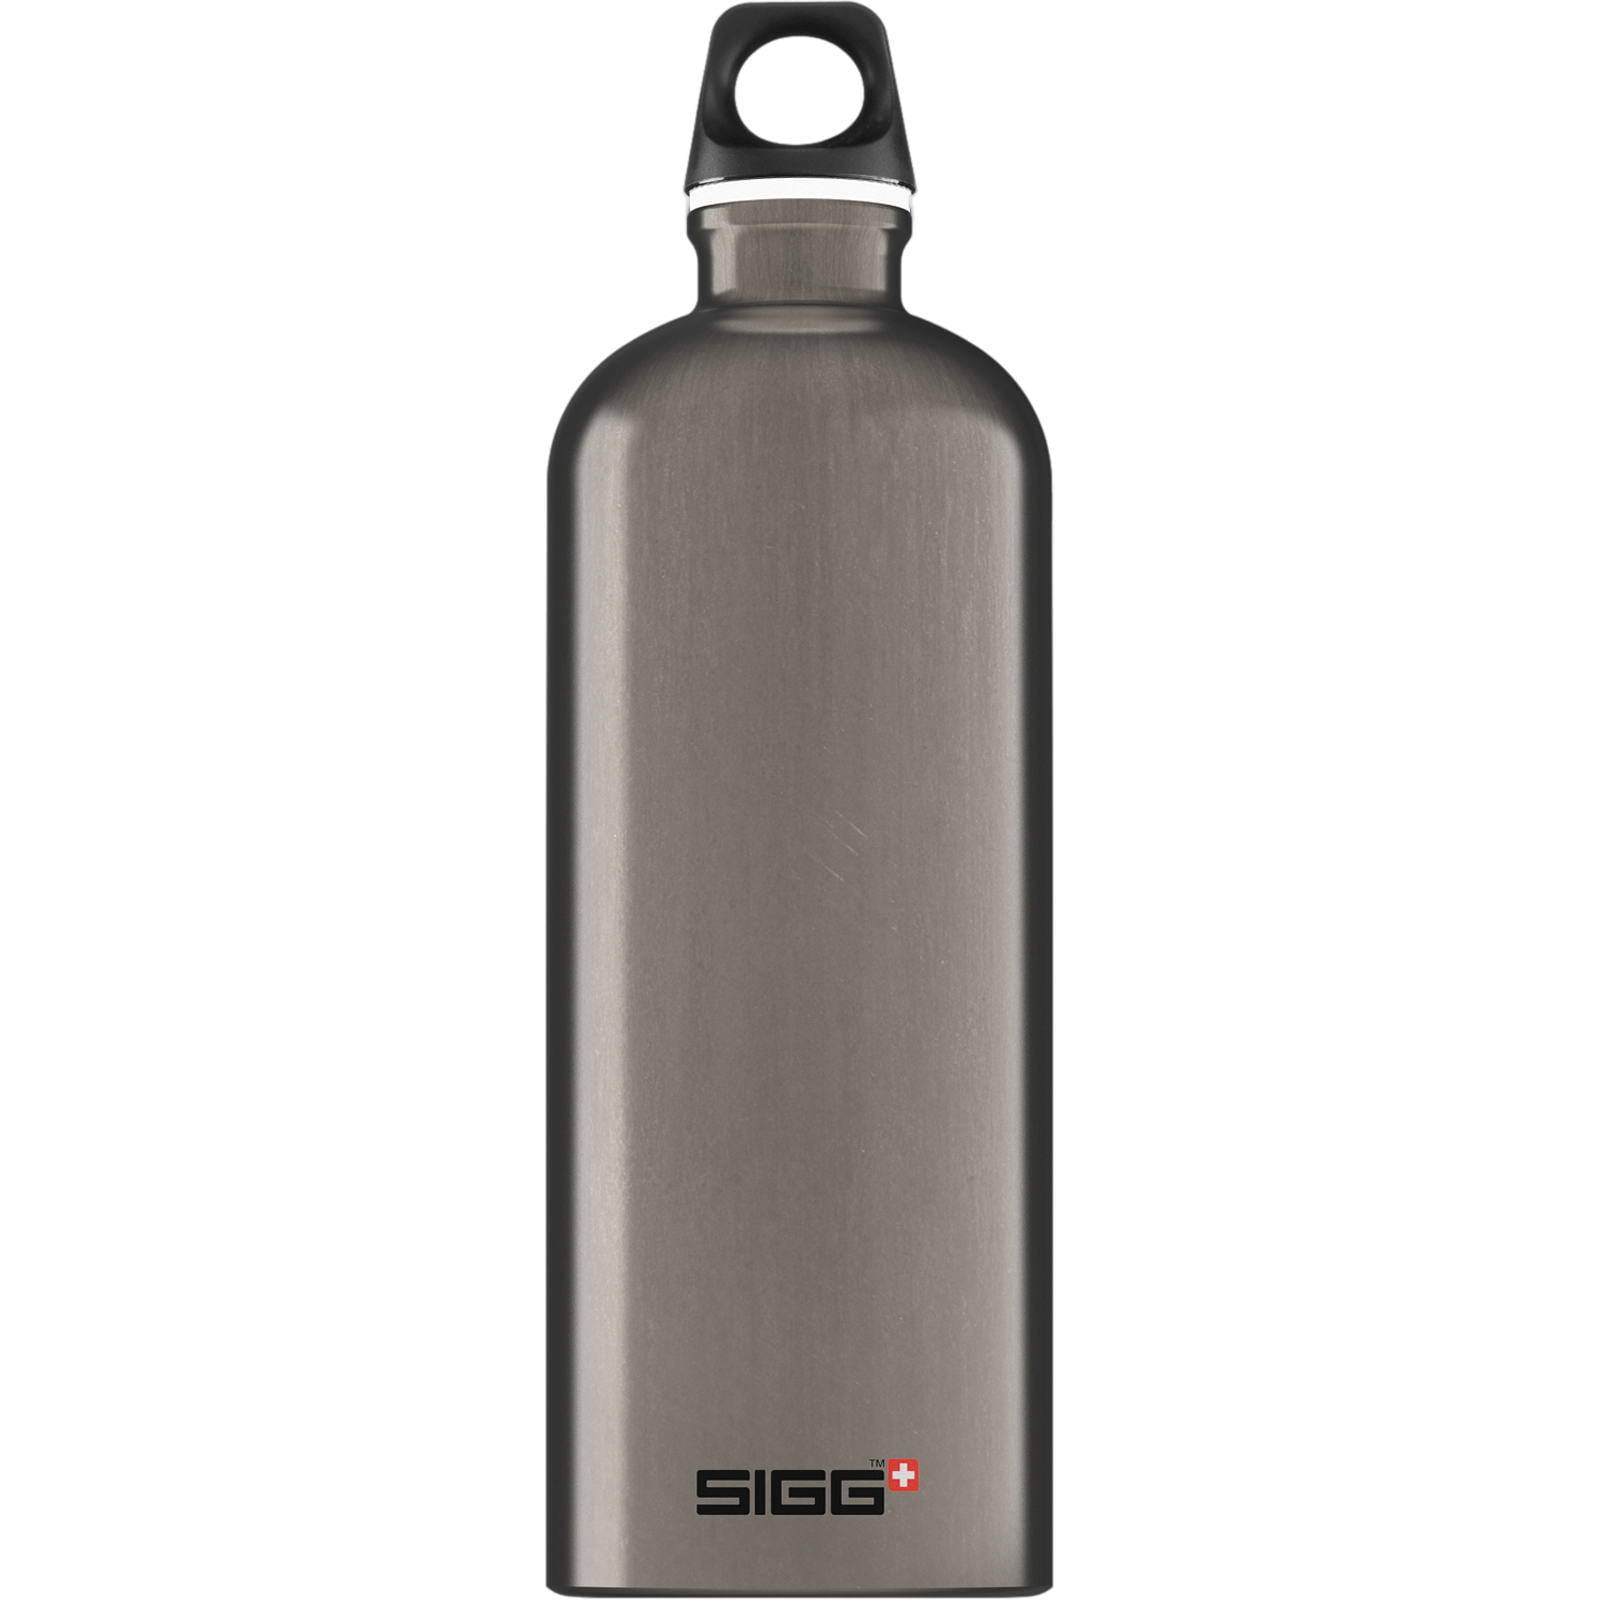 Sigg Traveller 1.0L - Alu-Trinkflasche smoked pearl - Bild 4